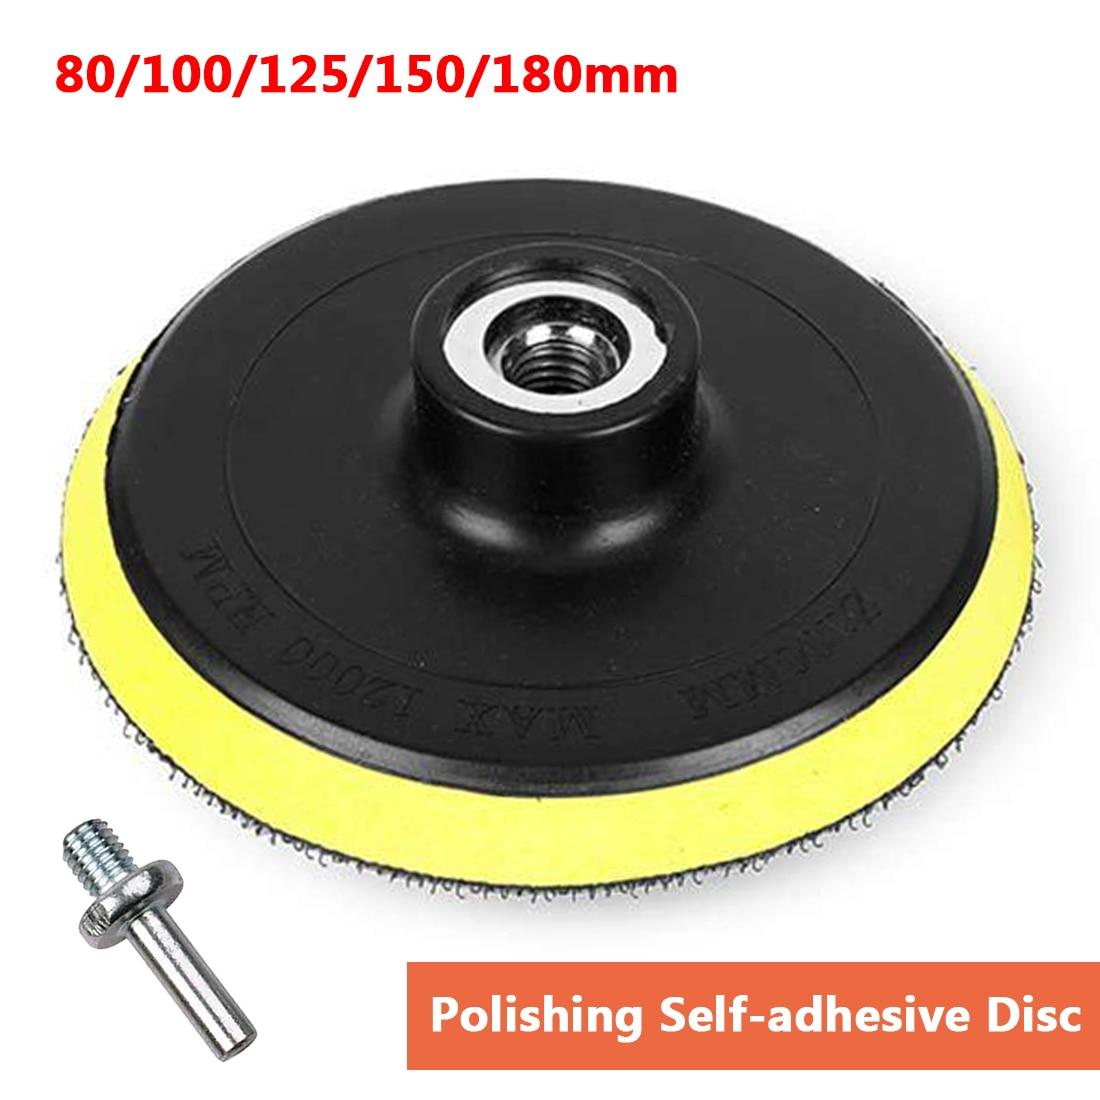 Dremel 80-180mm Polishing Self-adhesive Disc Polishing Sandpaper Sheet Adhesive Disc Chuck Angle Grinder Sticky Plate For Car